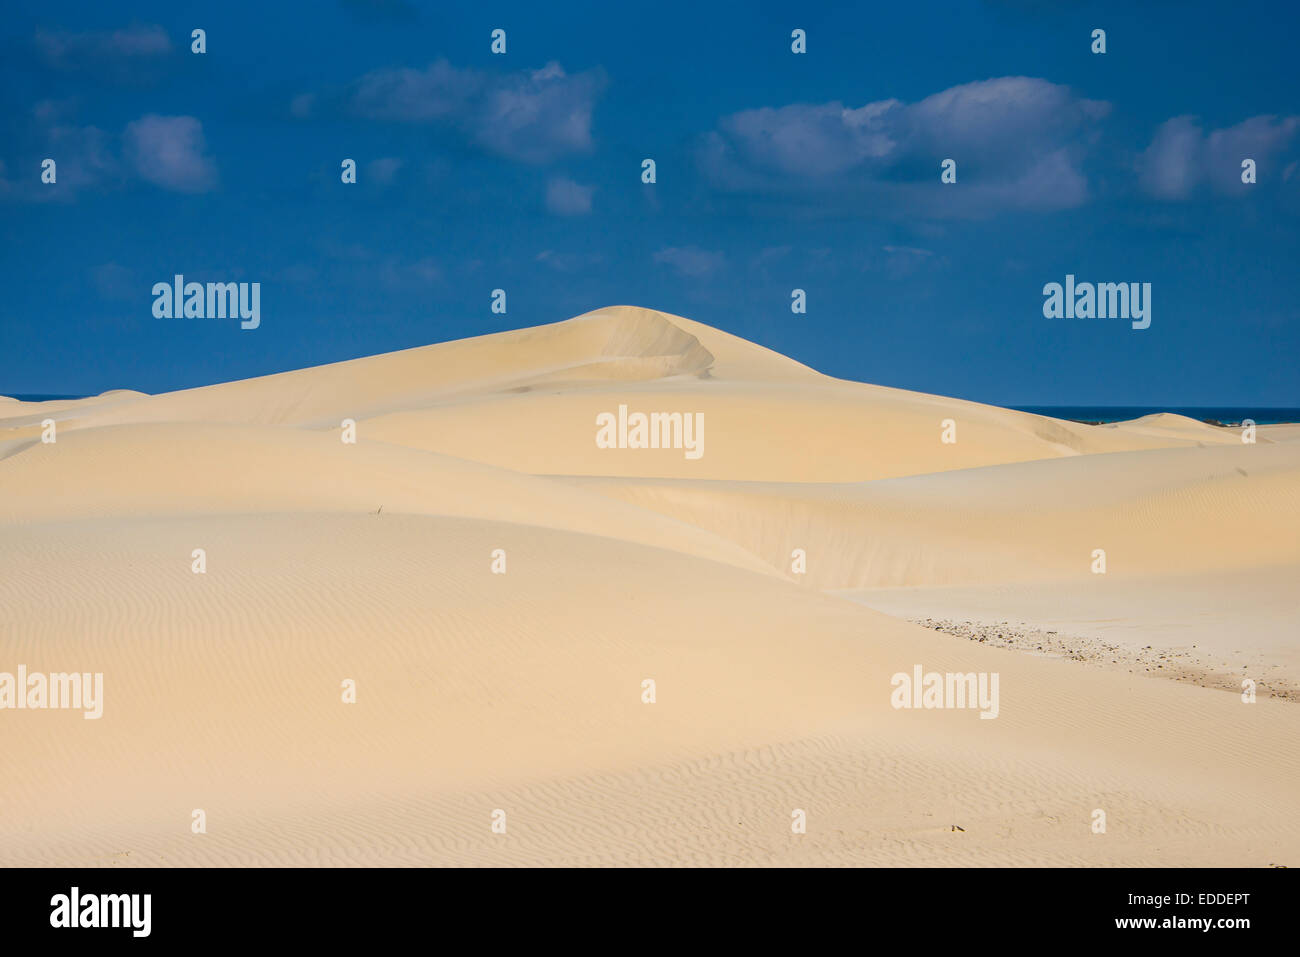 Sand dunes, island of Socotra, Yemen - Stock Image